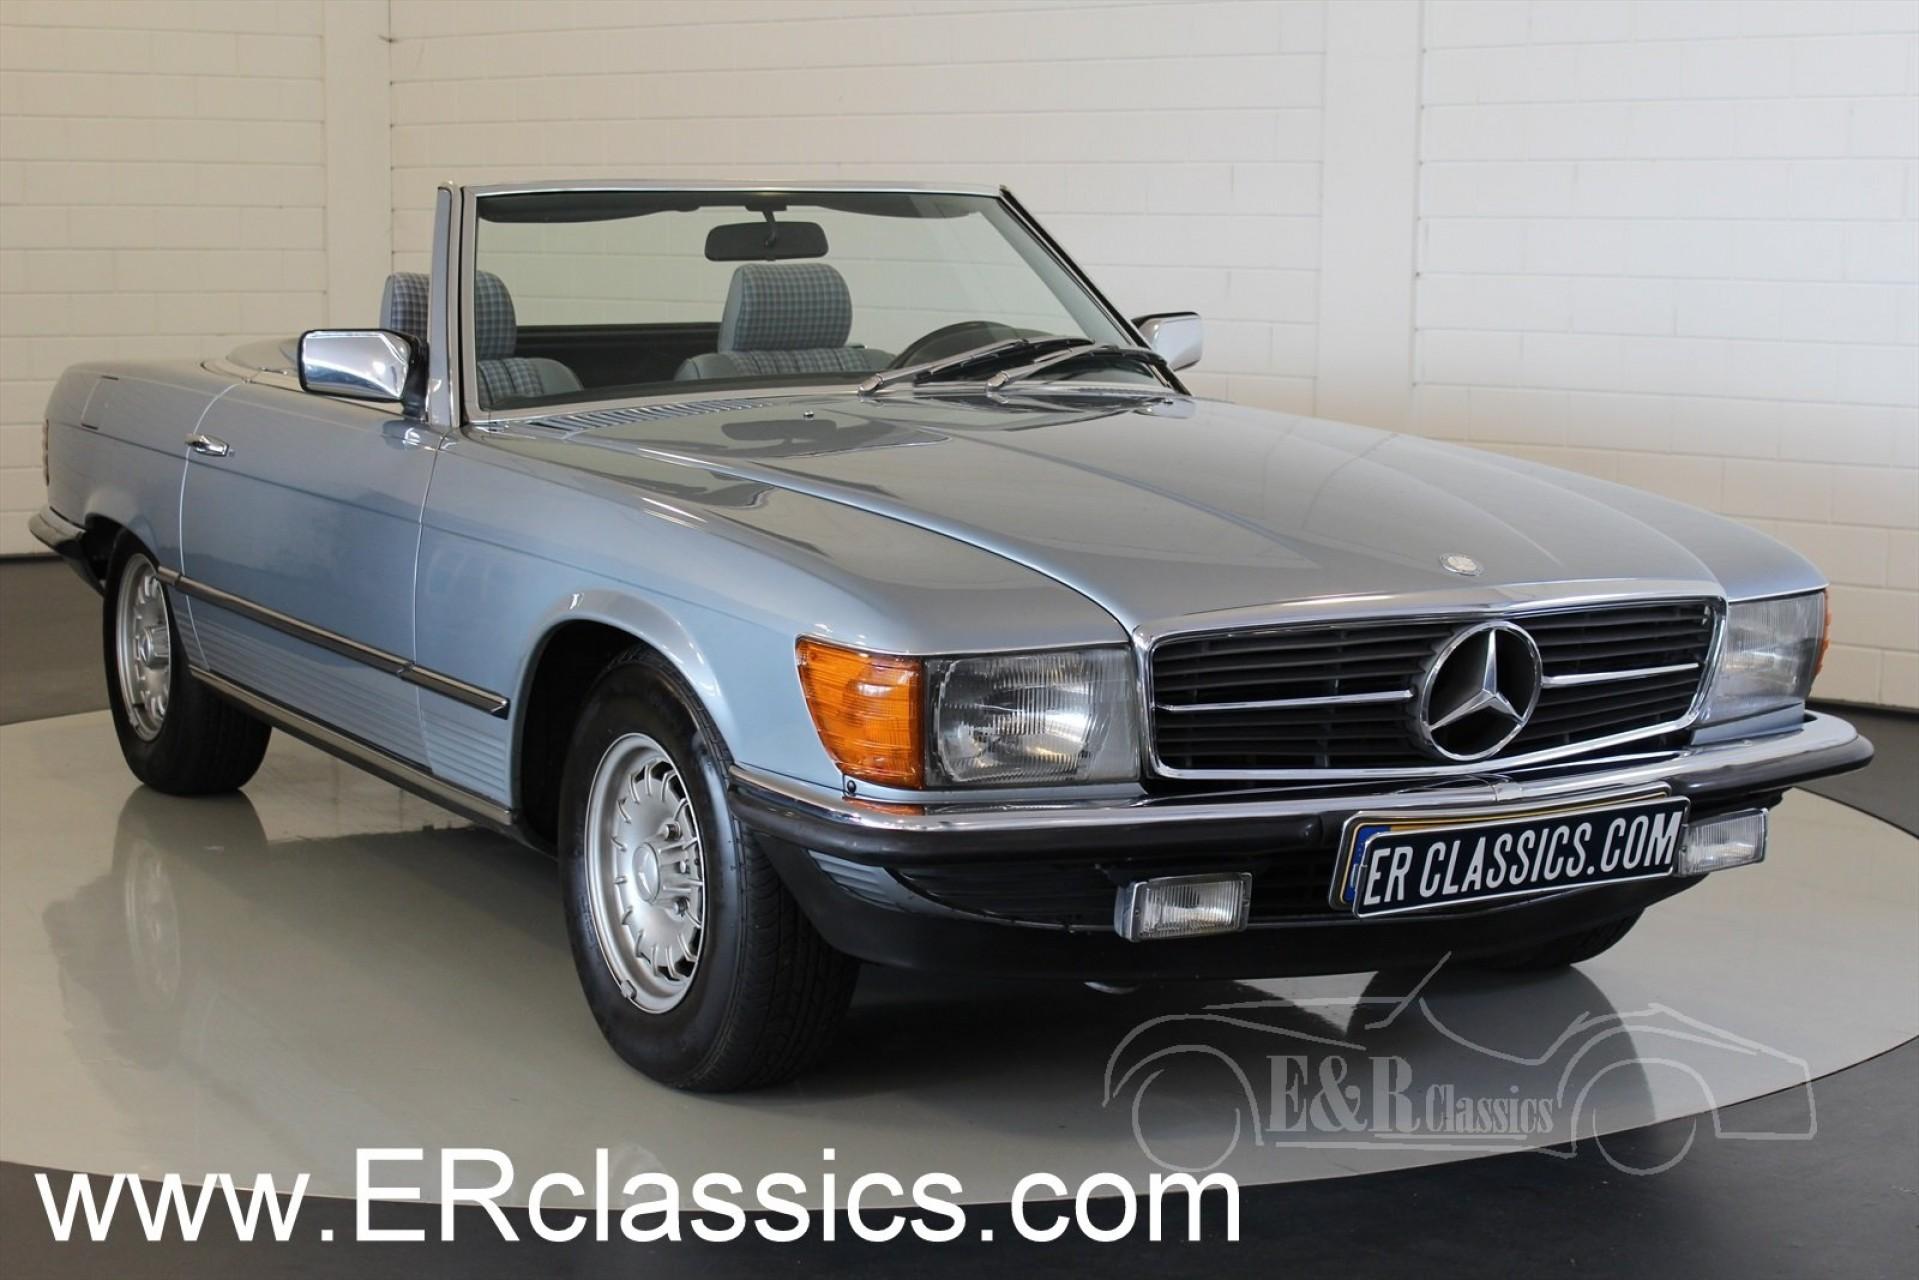 mercedes benz 280 sl cabriolet 1983 for sale at erclassics. Black Bedroom Furniture Sets. Home Design Ideas